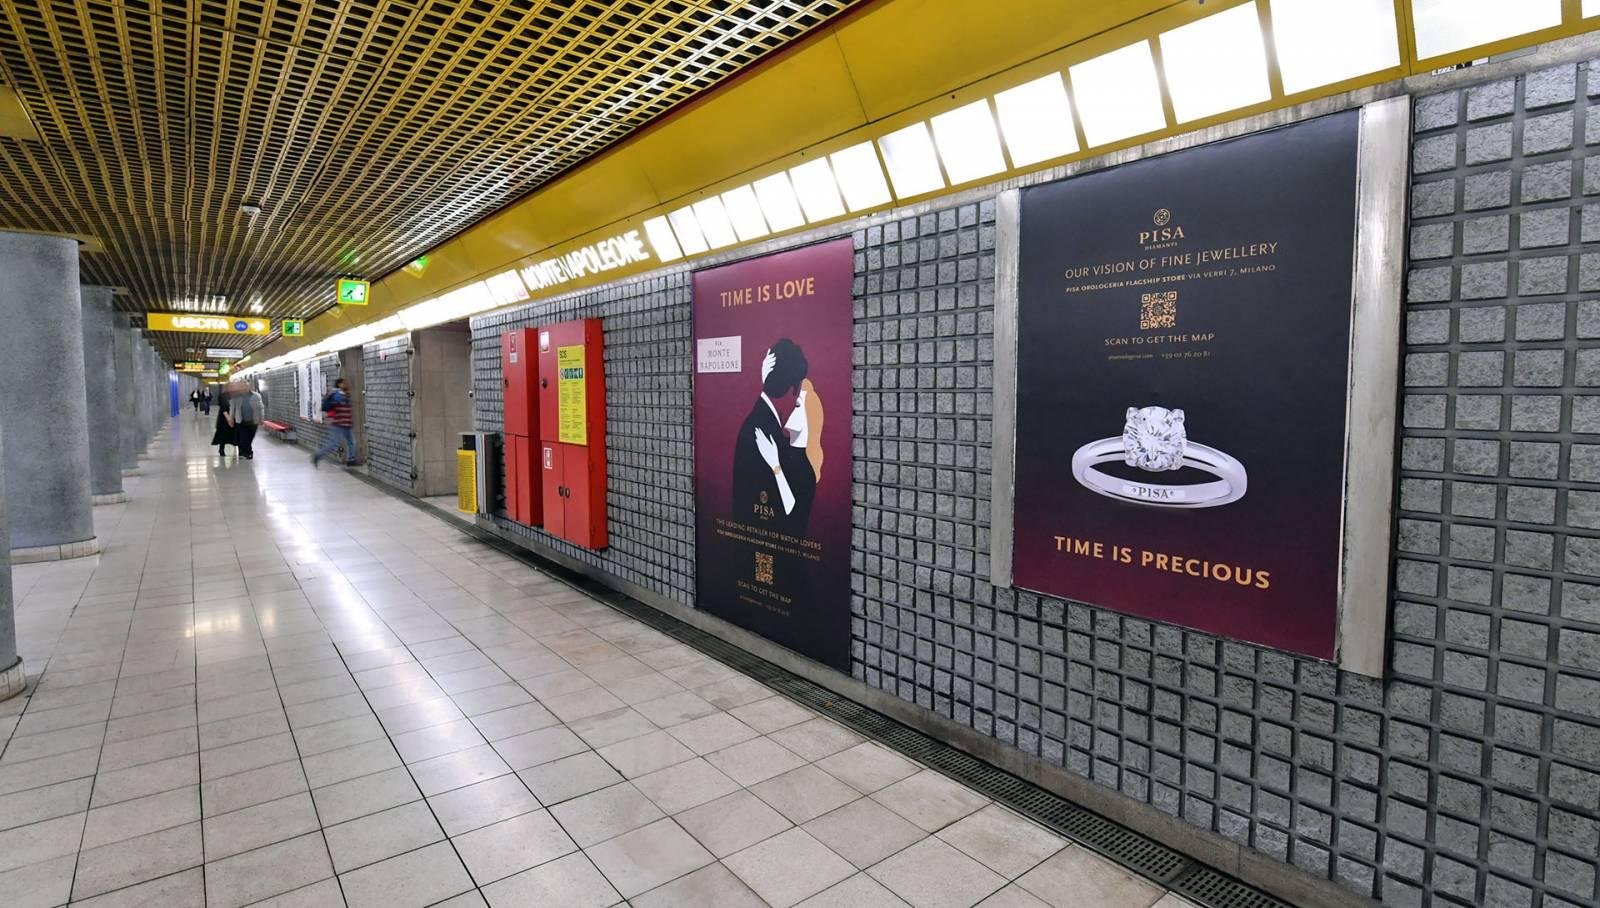 IGPDecaux Out of Home Milano pubblicità in metropolitana per Pisa Orologeria